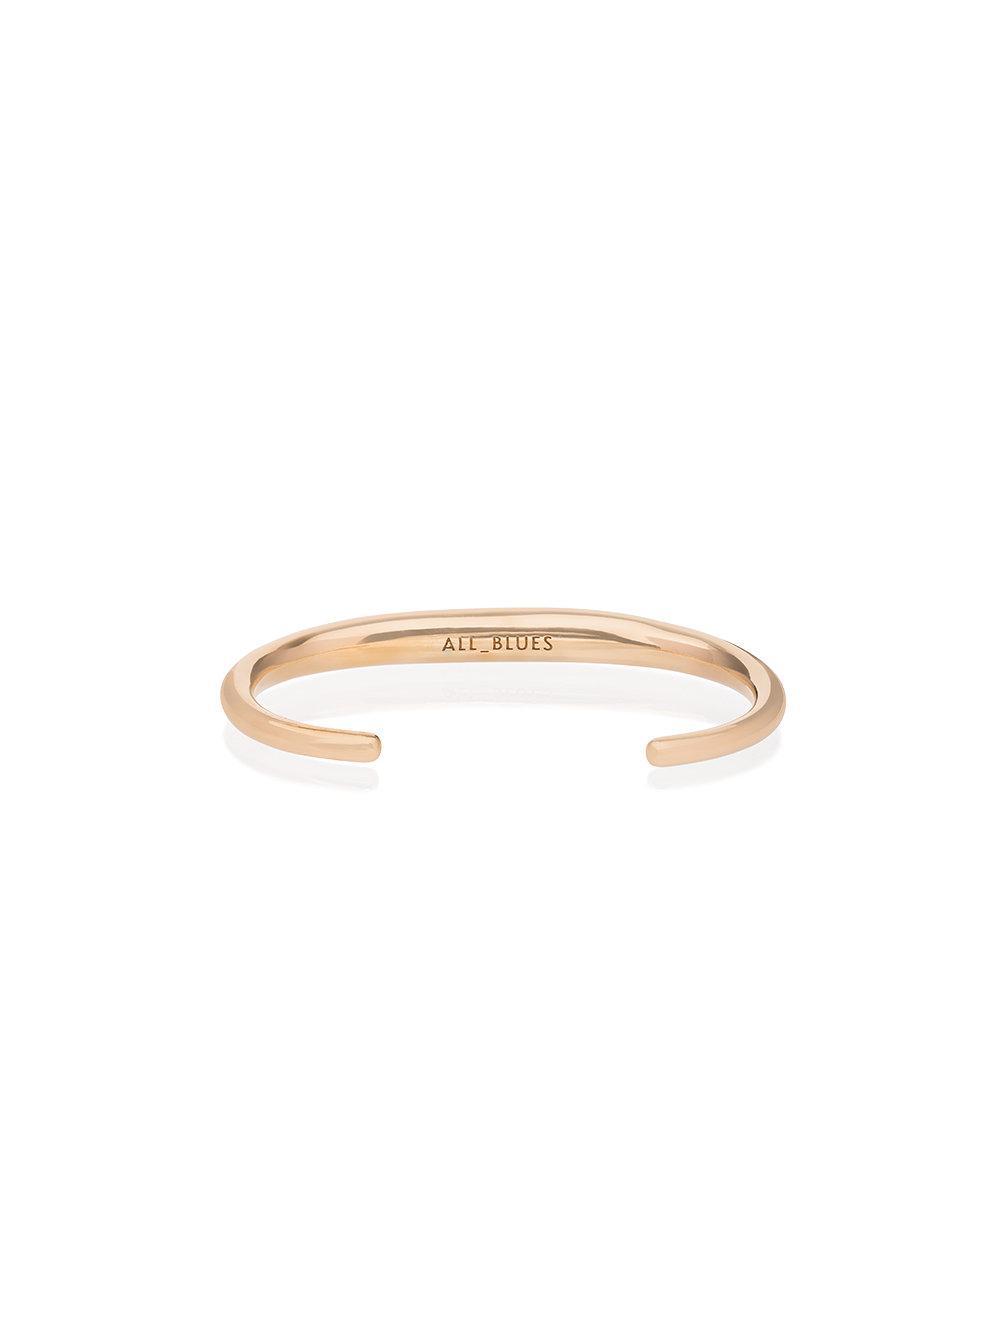 All_Blues Gold Fat Snake Bracelet - Metallic J8rnWAU6j